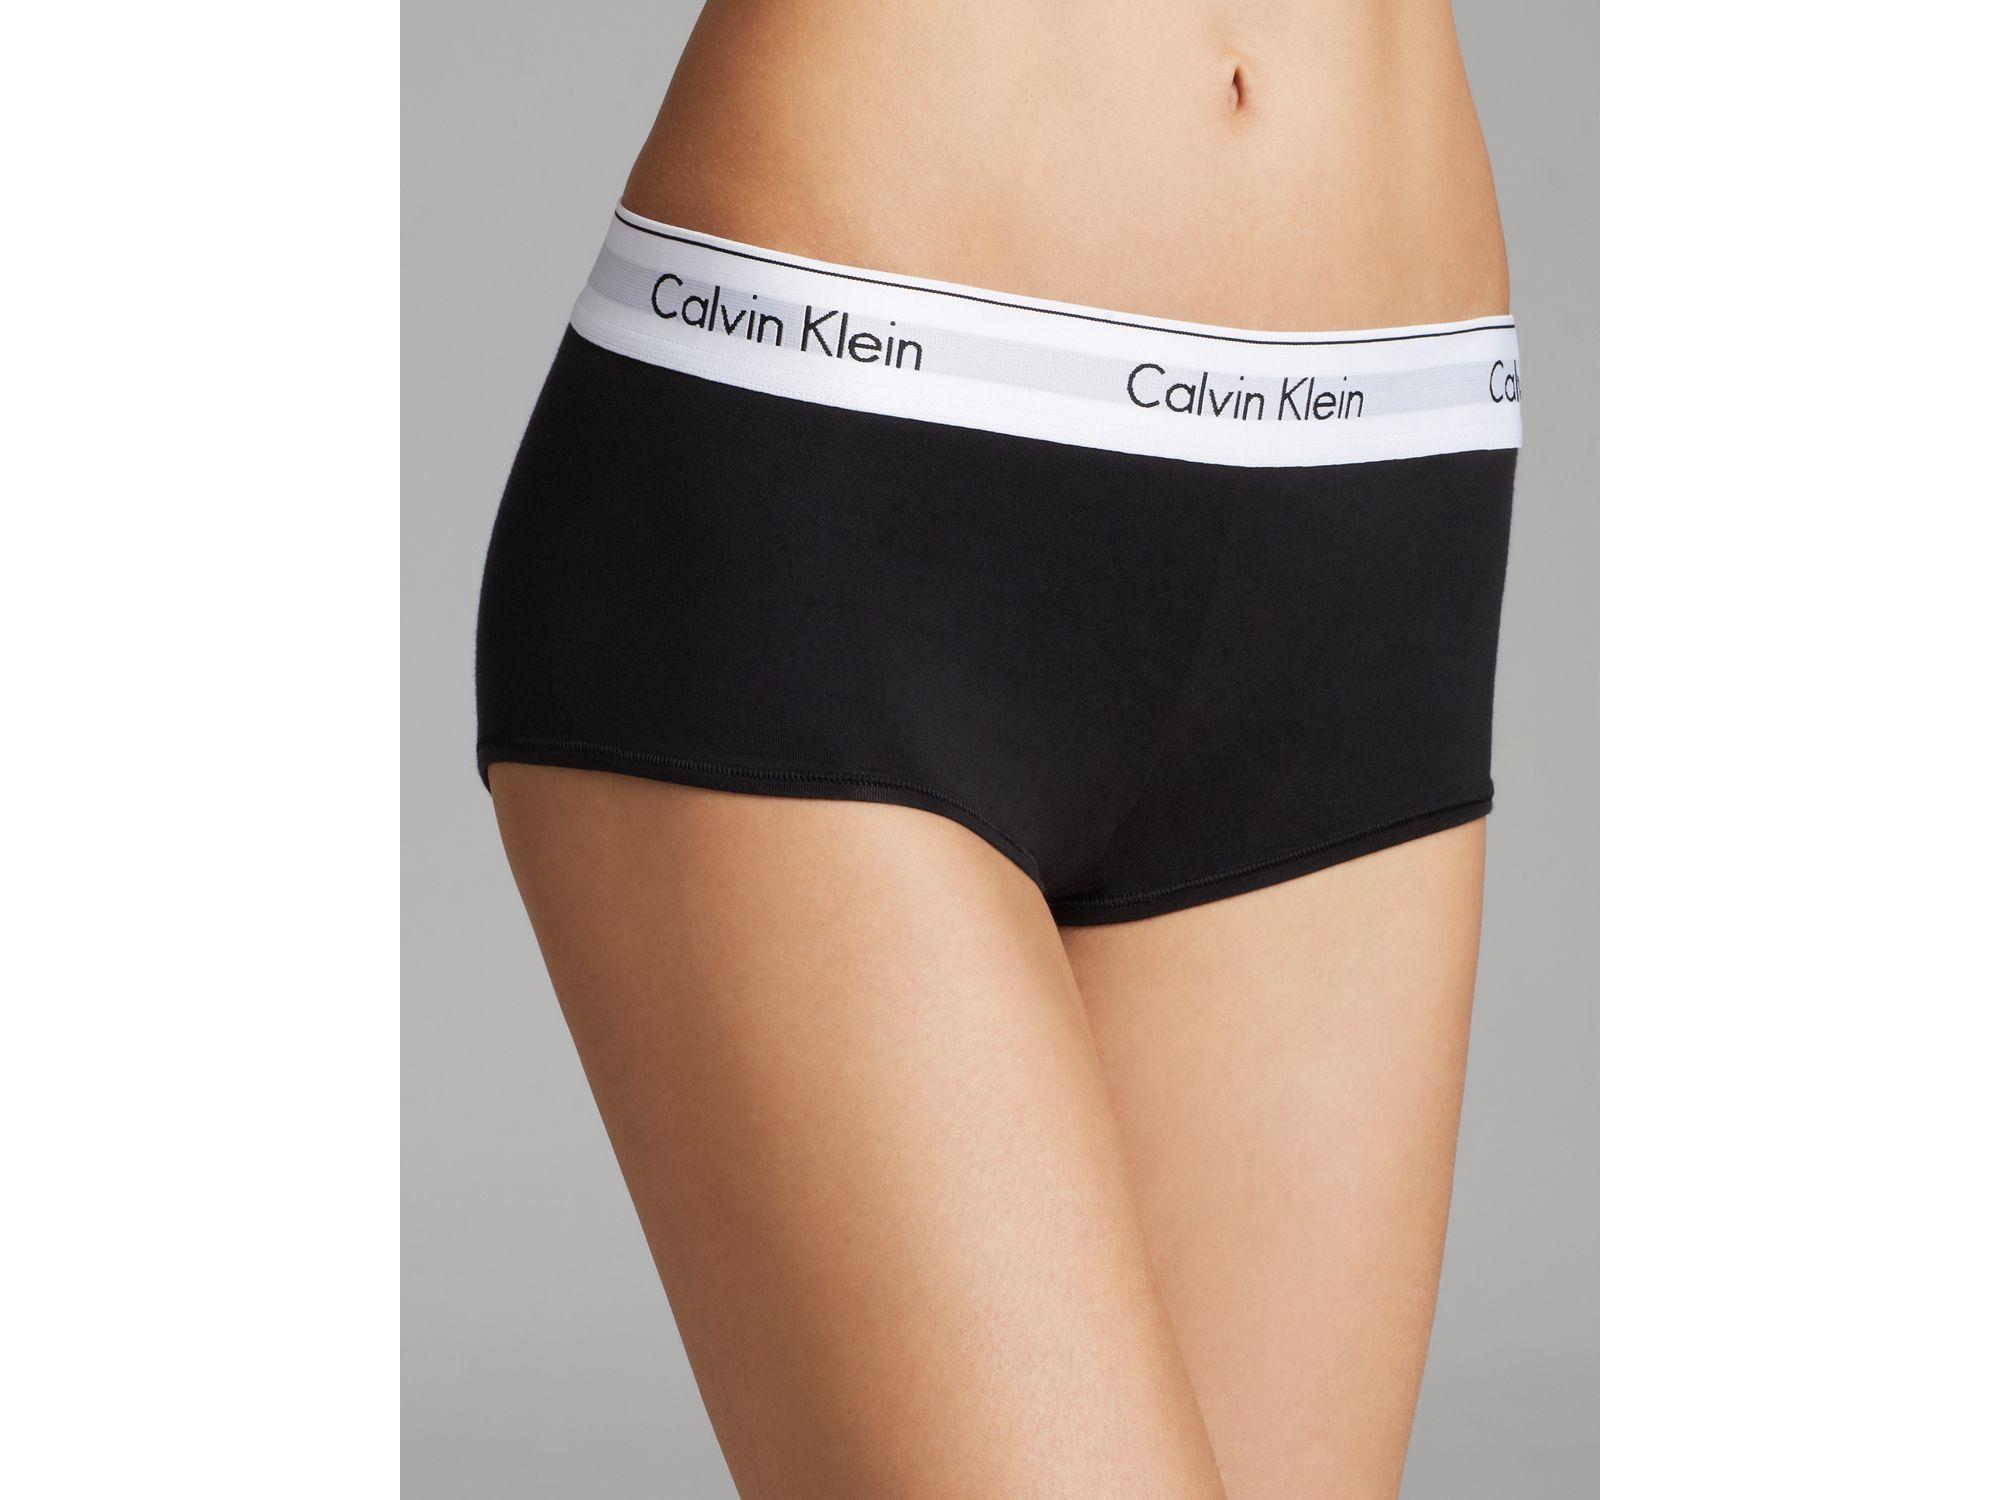 UNDERWEAR - Hotpants Calvin Klein Cheap Sale Professional Clearance Low Shipping Fee Cheap Online 2018 Unisex ESSKRczfR